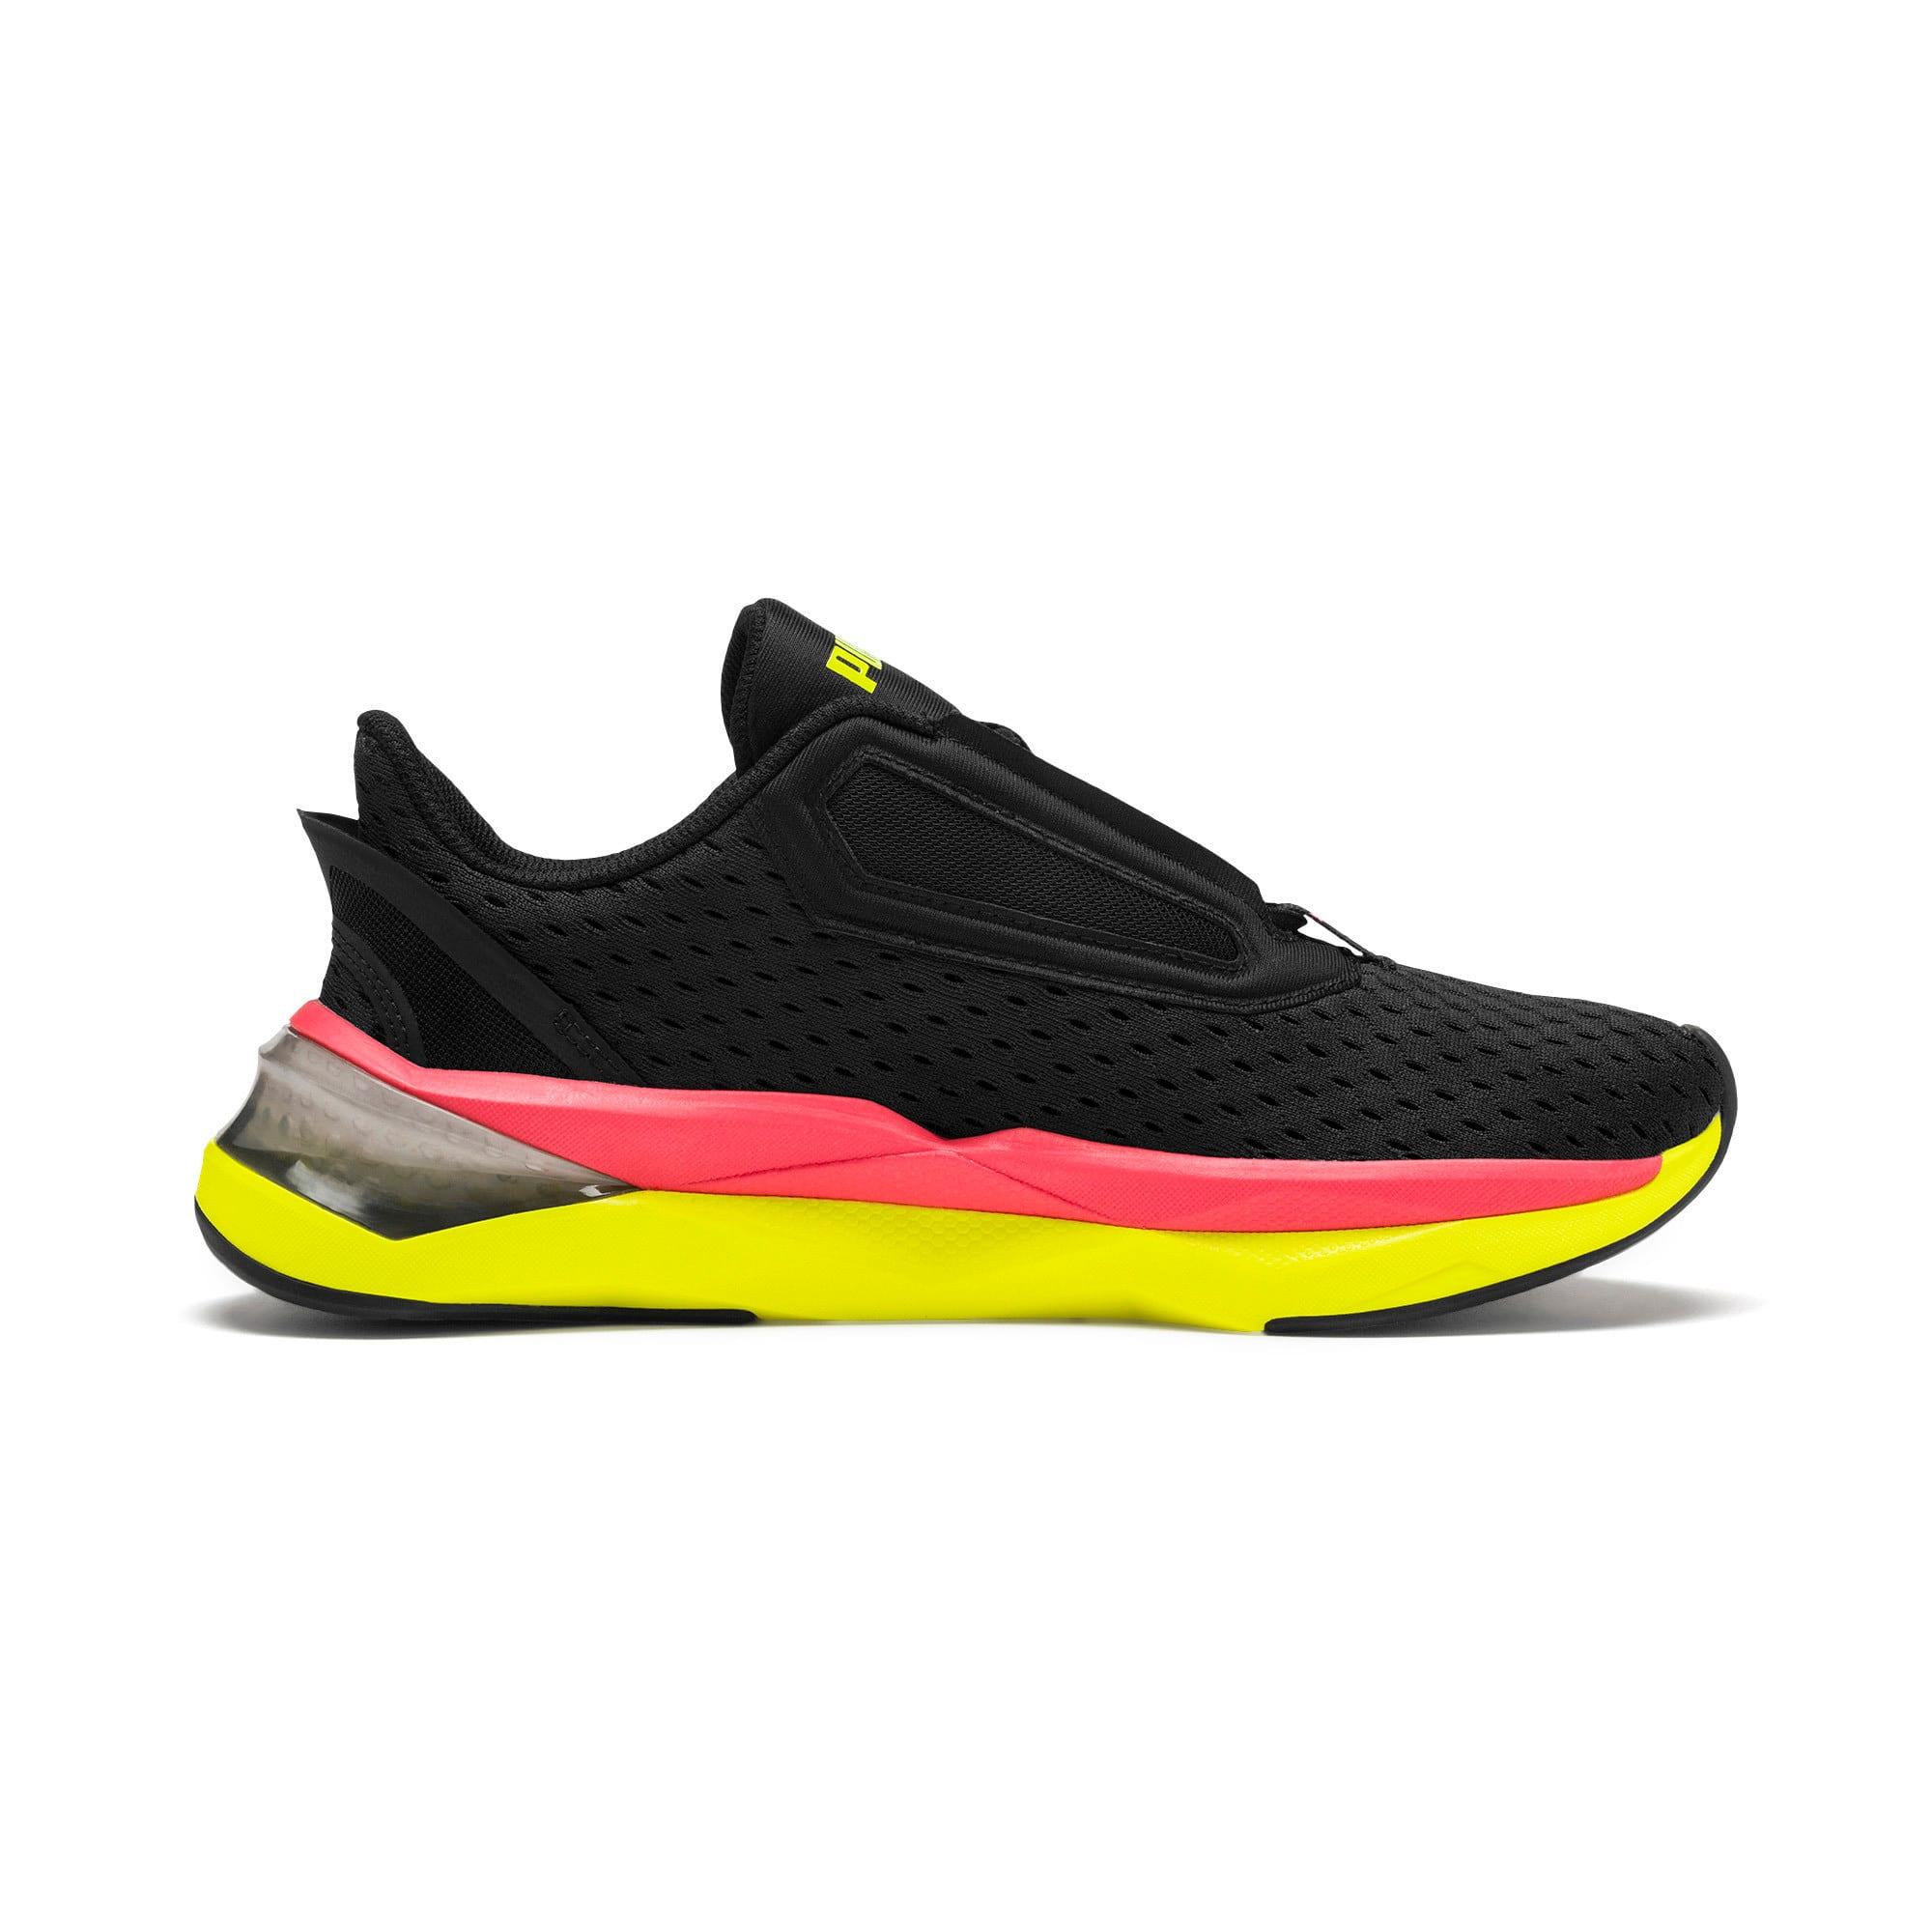 Thumbnail 9 of LQDCELL Shatter XT Women's Training Shoes, Puma Black-Yellow Alert, medium